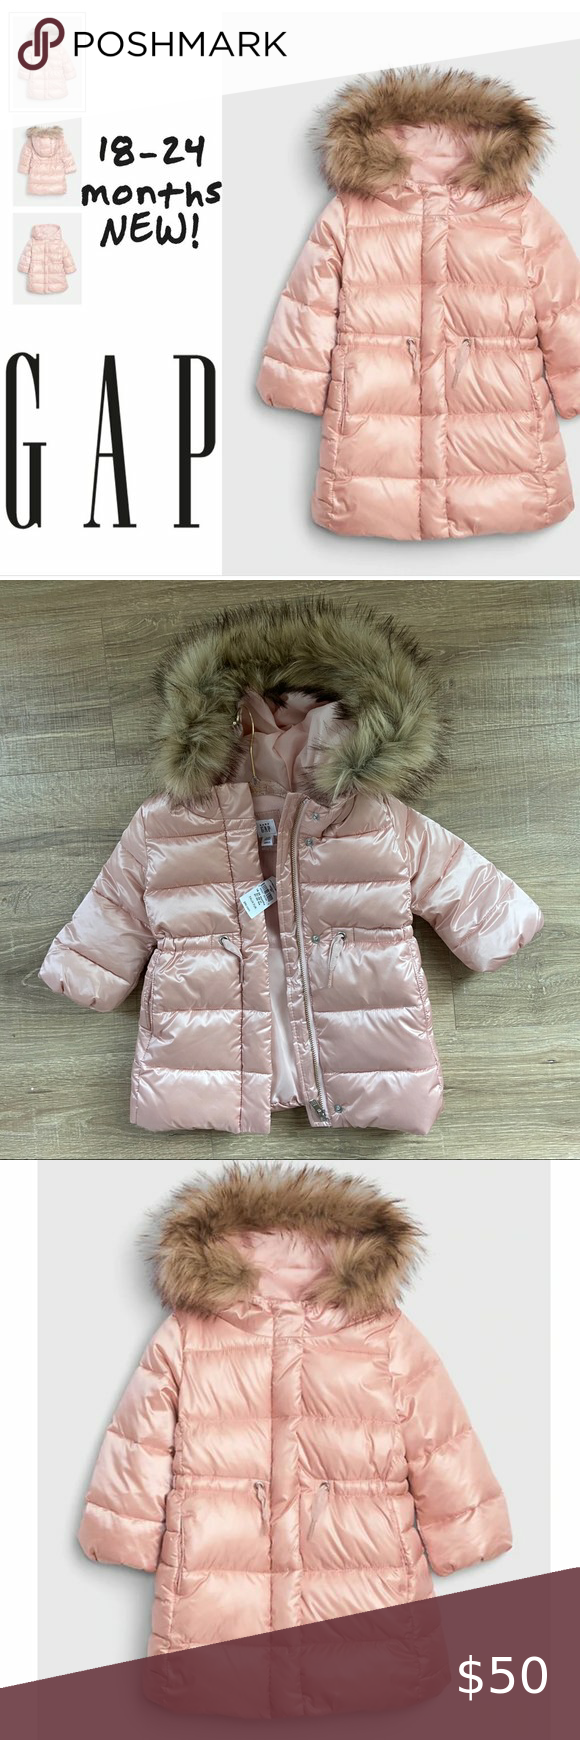 Gap Toddler Coldcontrol Max Long Puffer Pink 18 24 Long Puffer Girls Puffer Jacket Kids Winter Jackets [ 1740 x 580 Pixel ]